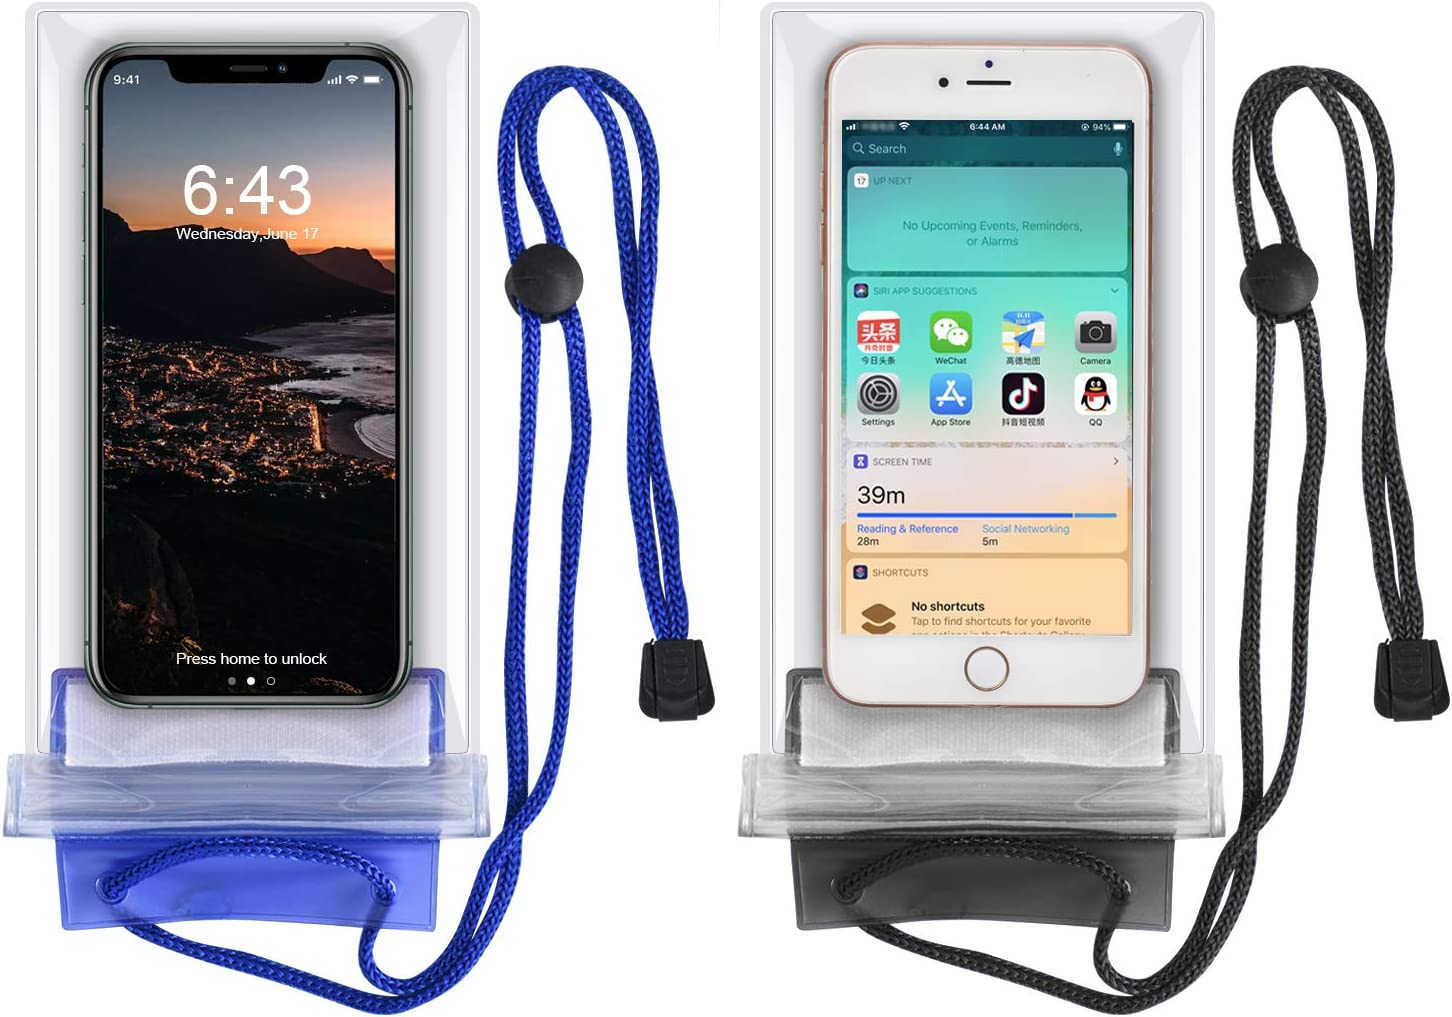 KEEHOM Funda Impermeable Universal 2 Unidades, Bolsa para Móvil Estanca a Prueba de Agua para iPhone 11/XS MAX/XR Samsung Galaxy Huawei P40 P30 Pro Xiaomi OnePlus y Otros Teléfonos hasta 7 Pulgadas